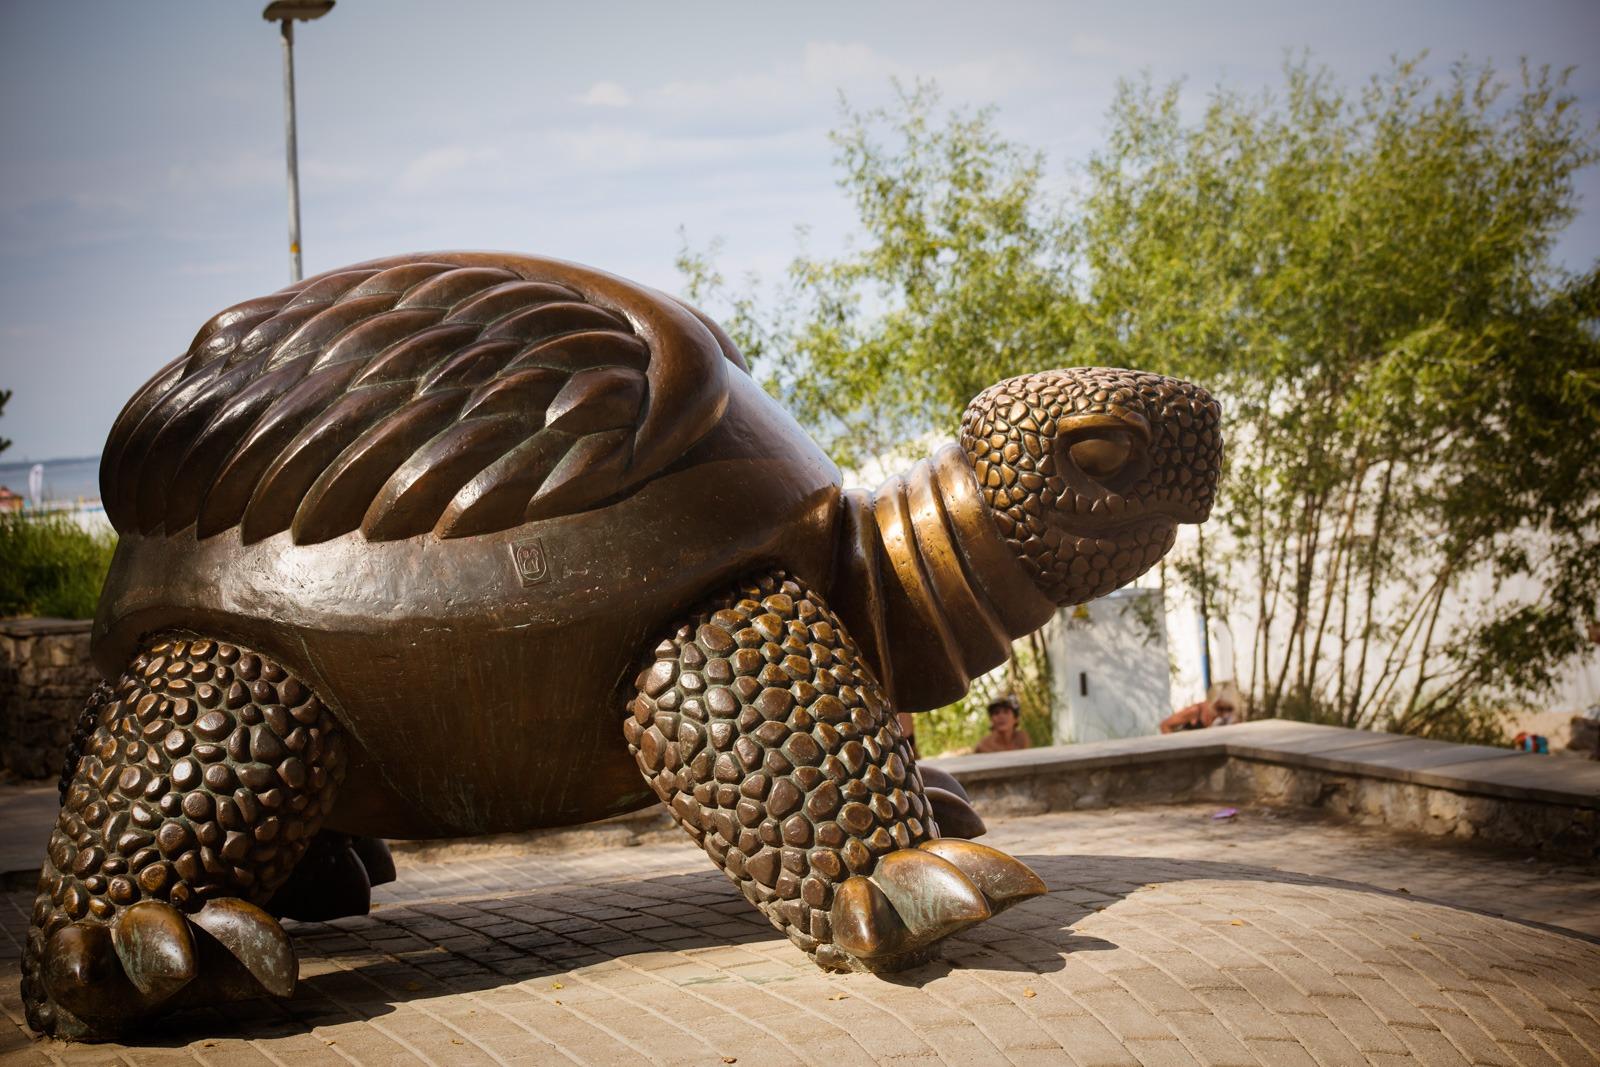 Die Schildkröte Brunurupucis